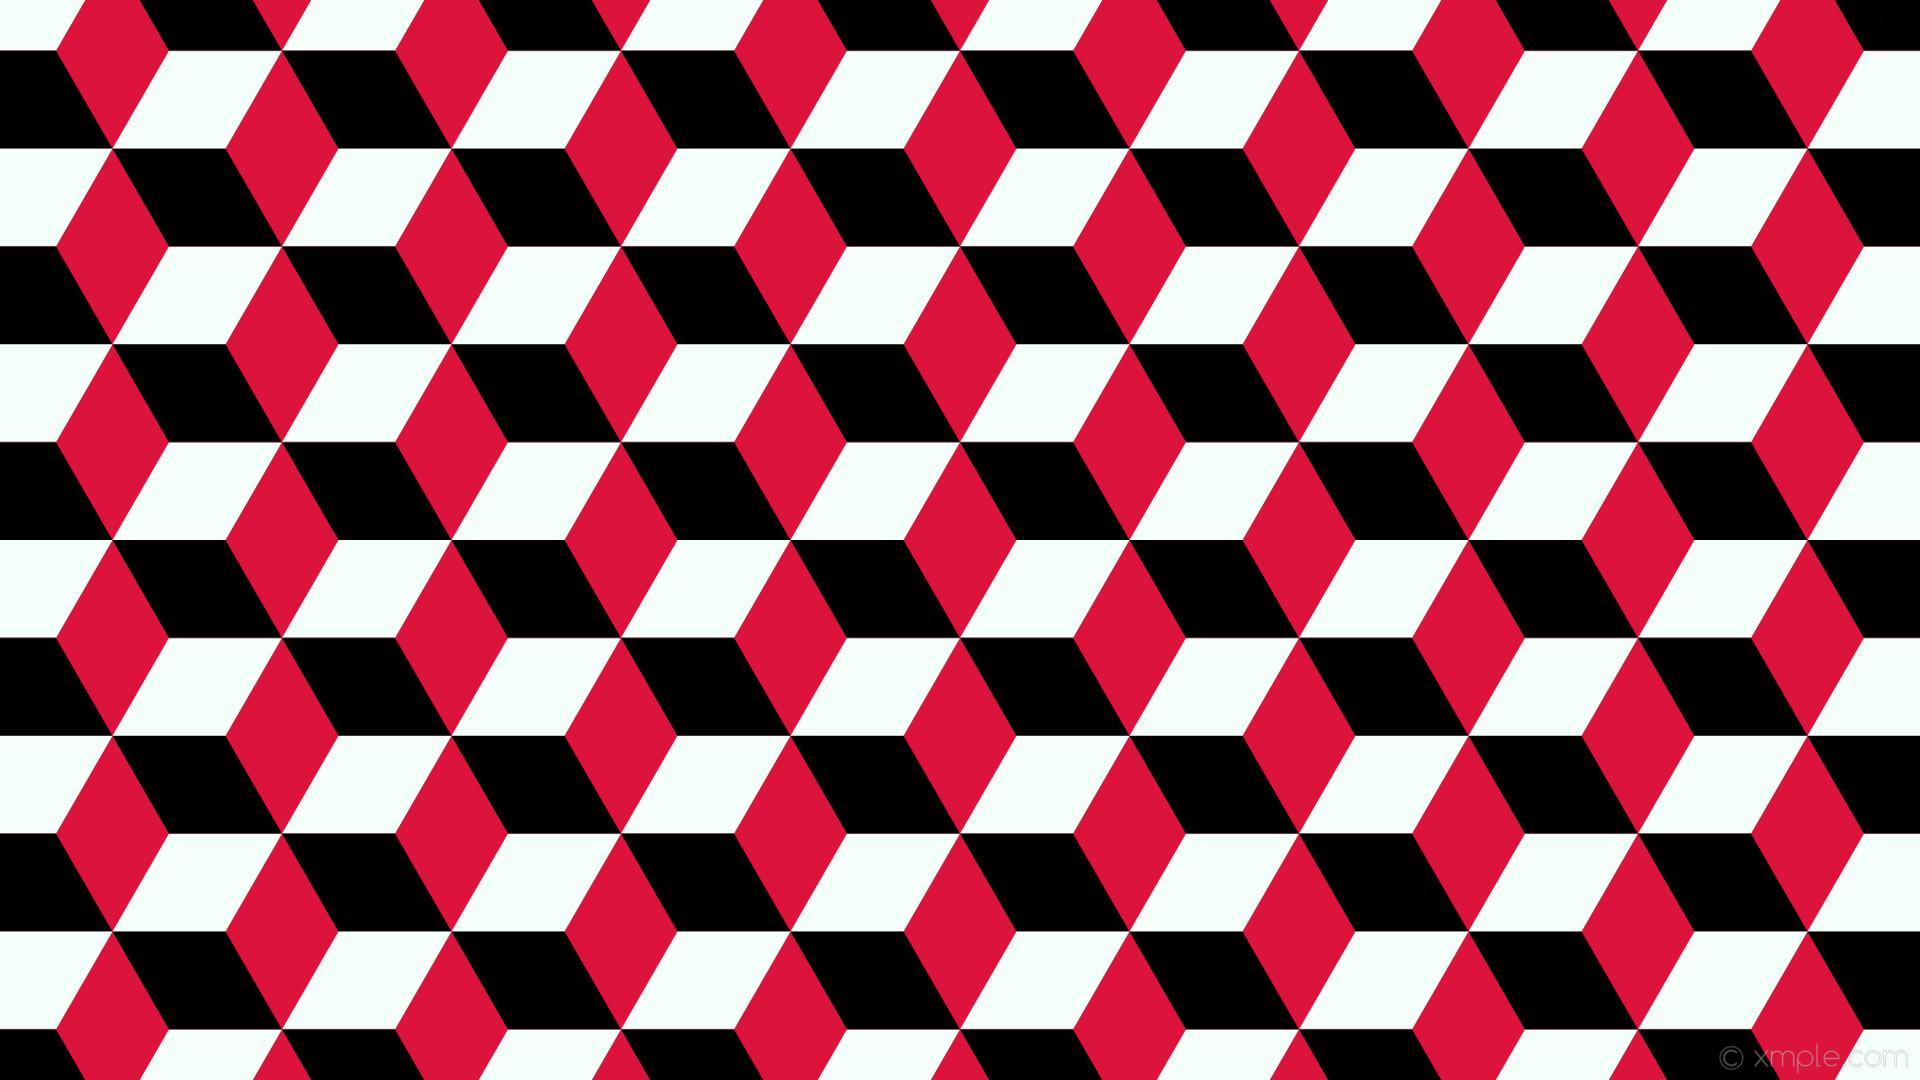 wallpaper 3d cubes red white black crimson mint cream #dc143c #f5fffa  #000000 270